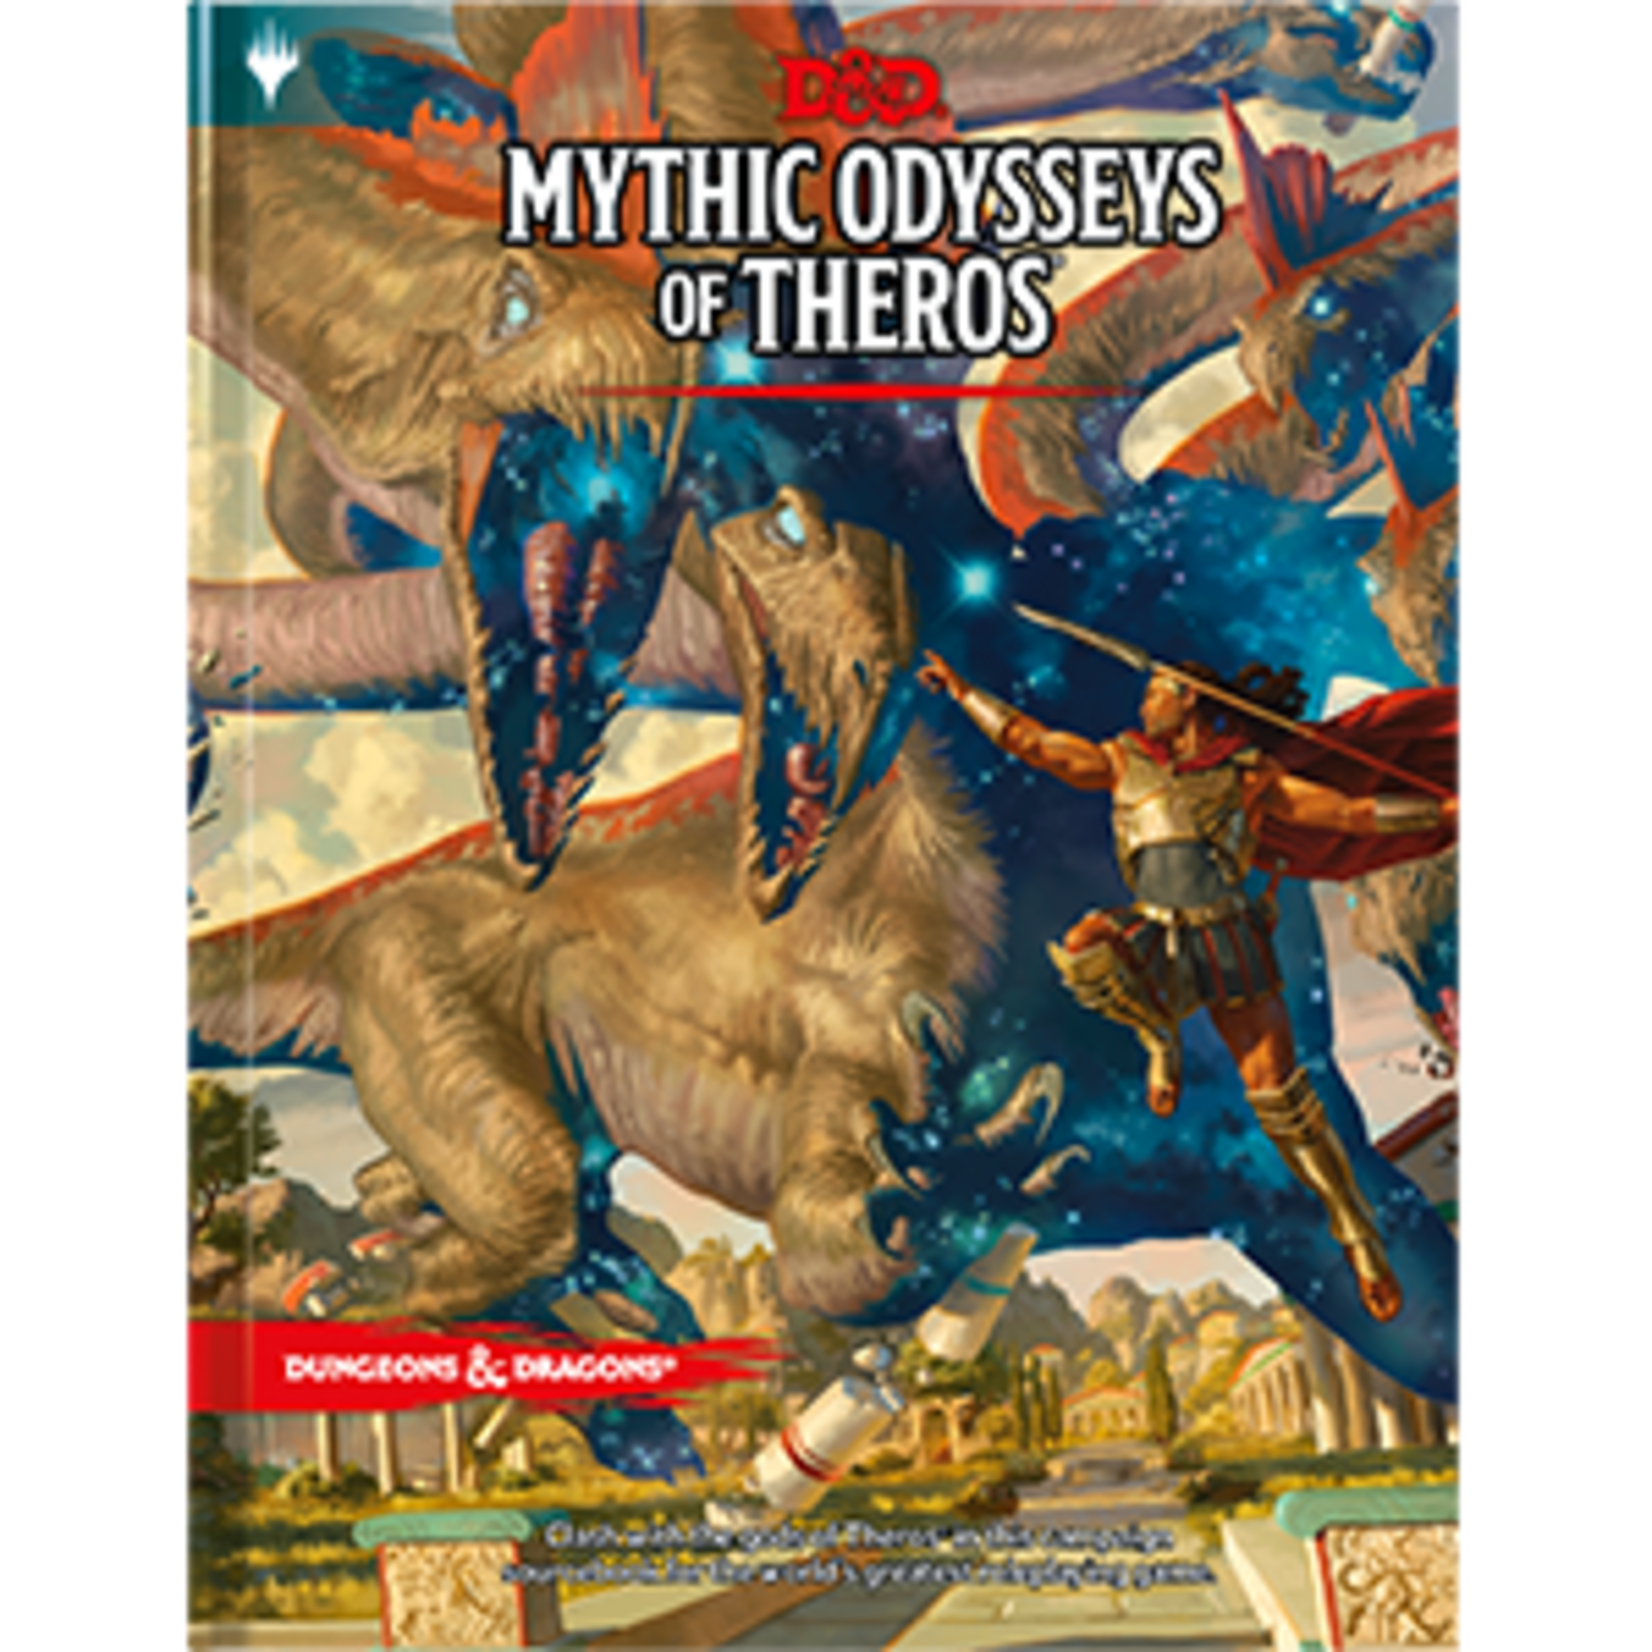 D&D: Mythic Odysseys of Theros